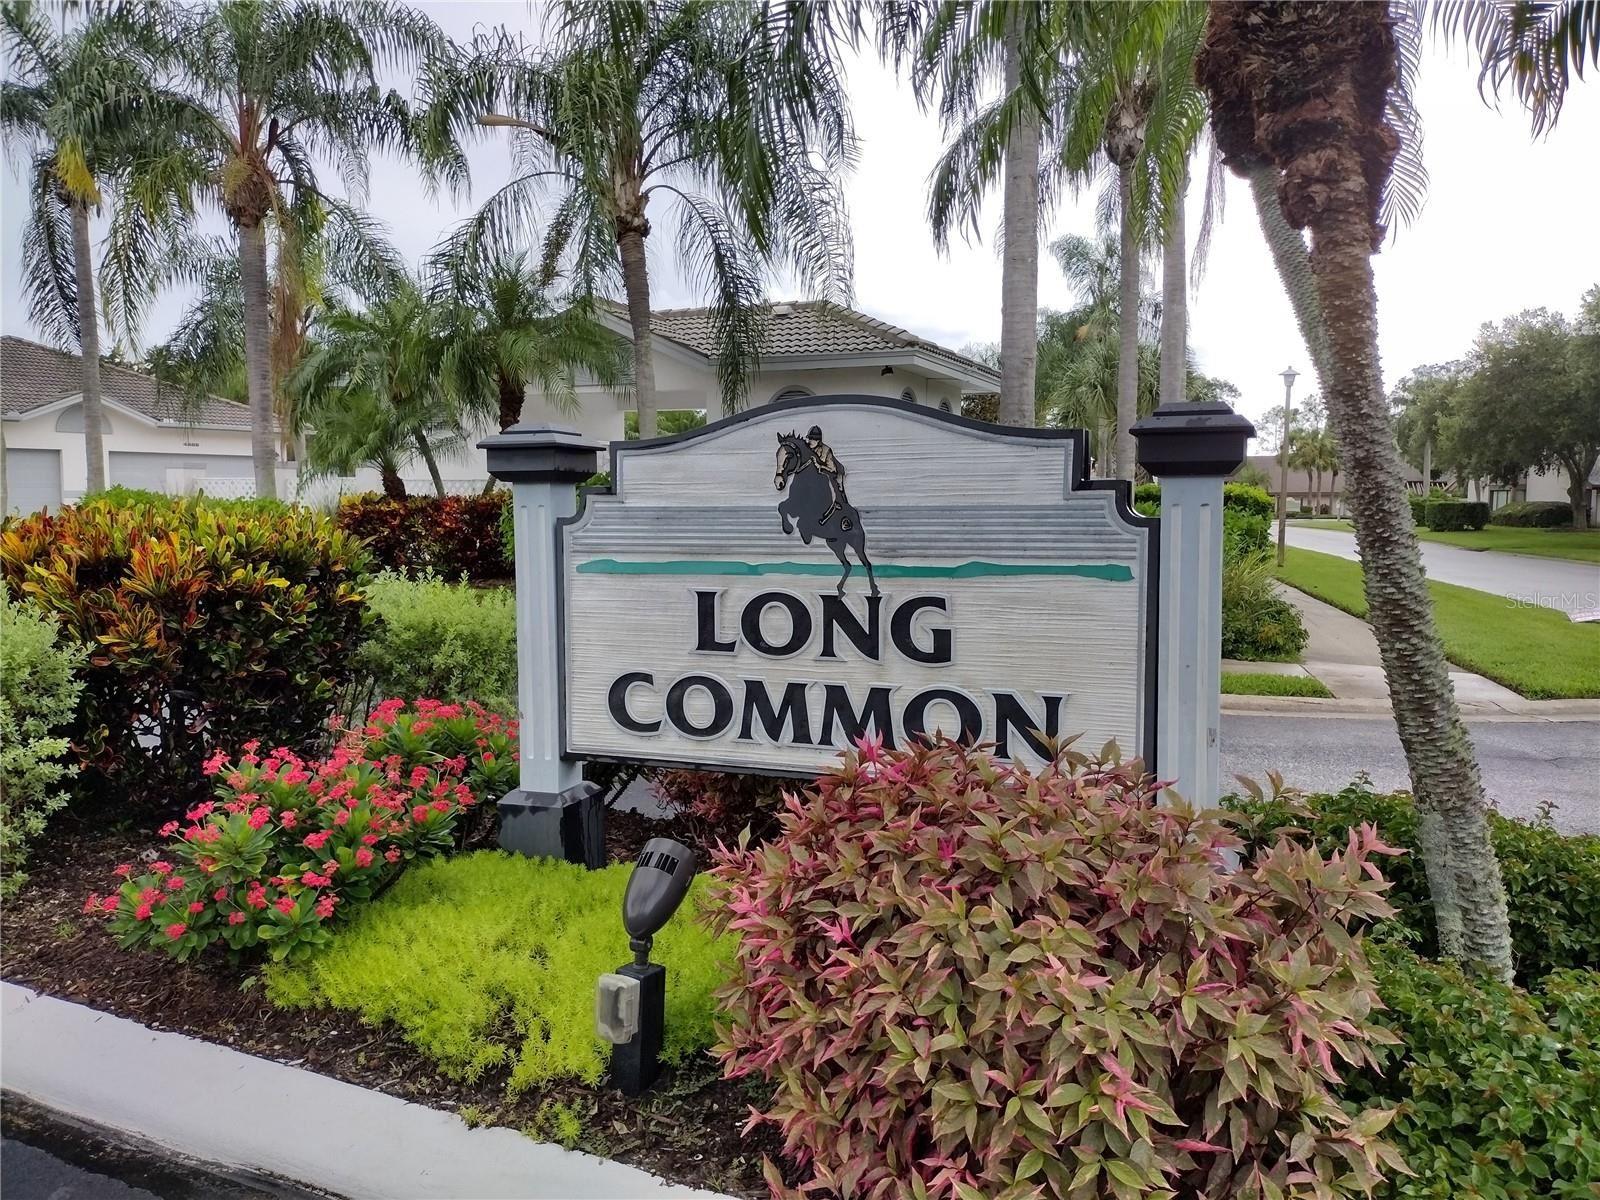 Photo of 5600 W LONG COMMON COURT #2, SARASOTA, FL 34235 (MLS # A4515300)